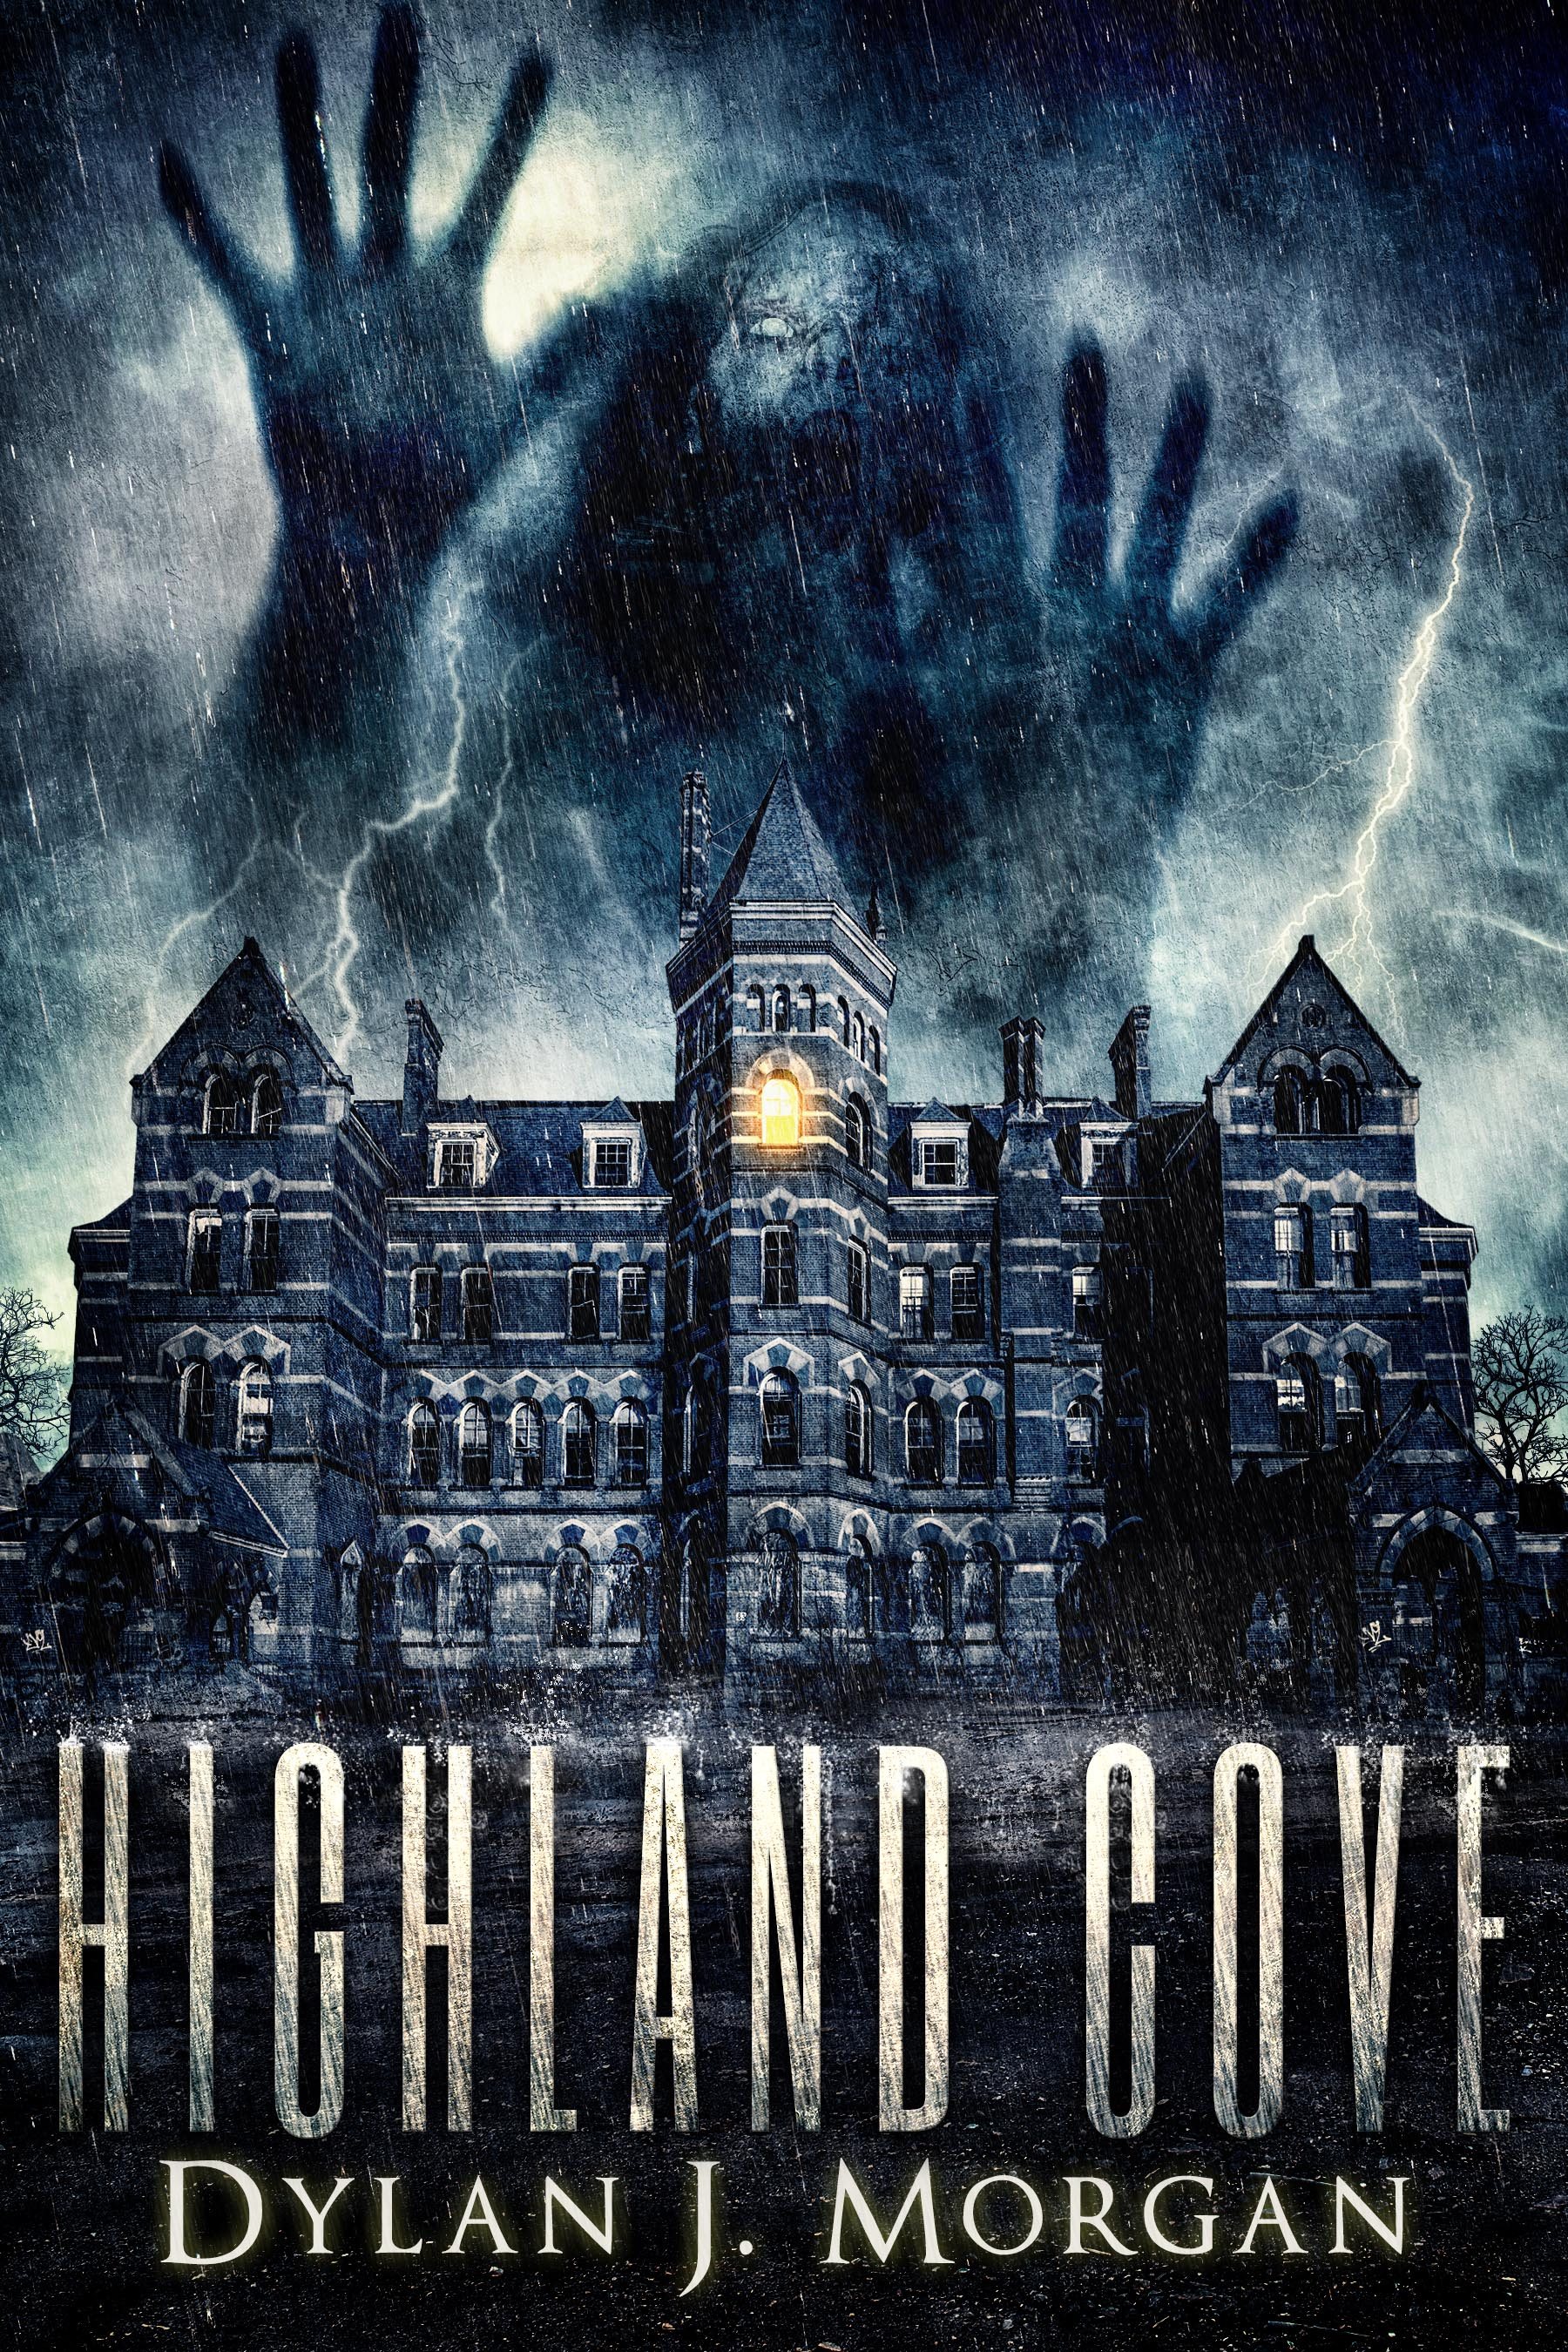 [PDF] [EPUB] Highland Cove Download by Dylan J. Morgan